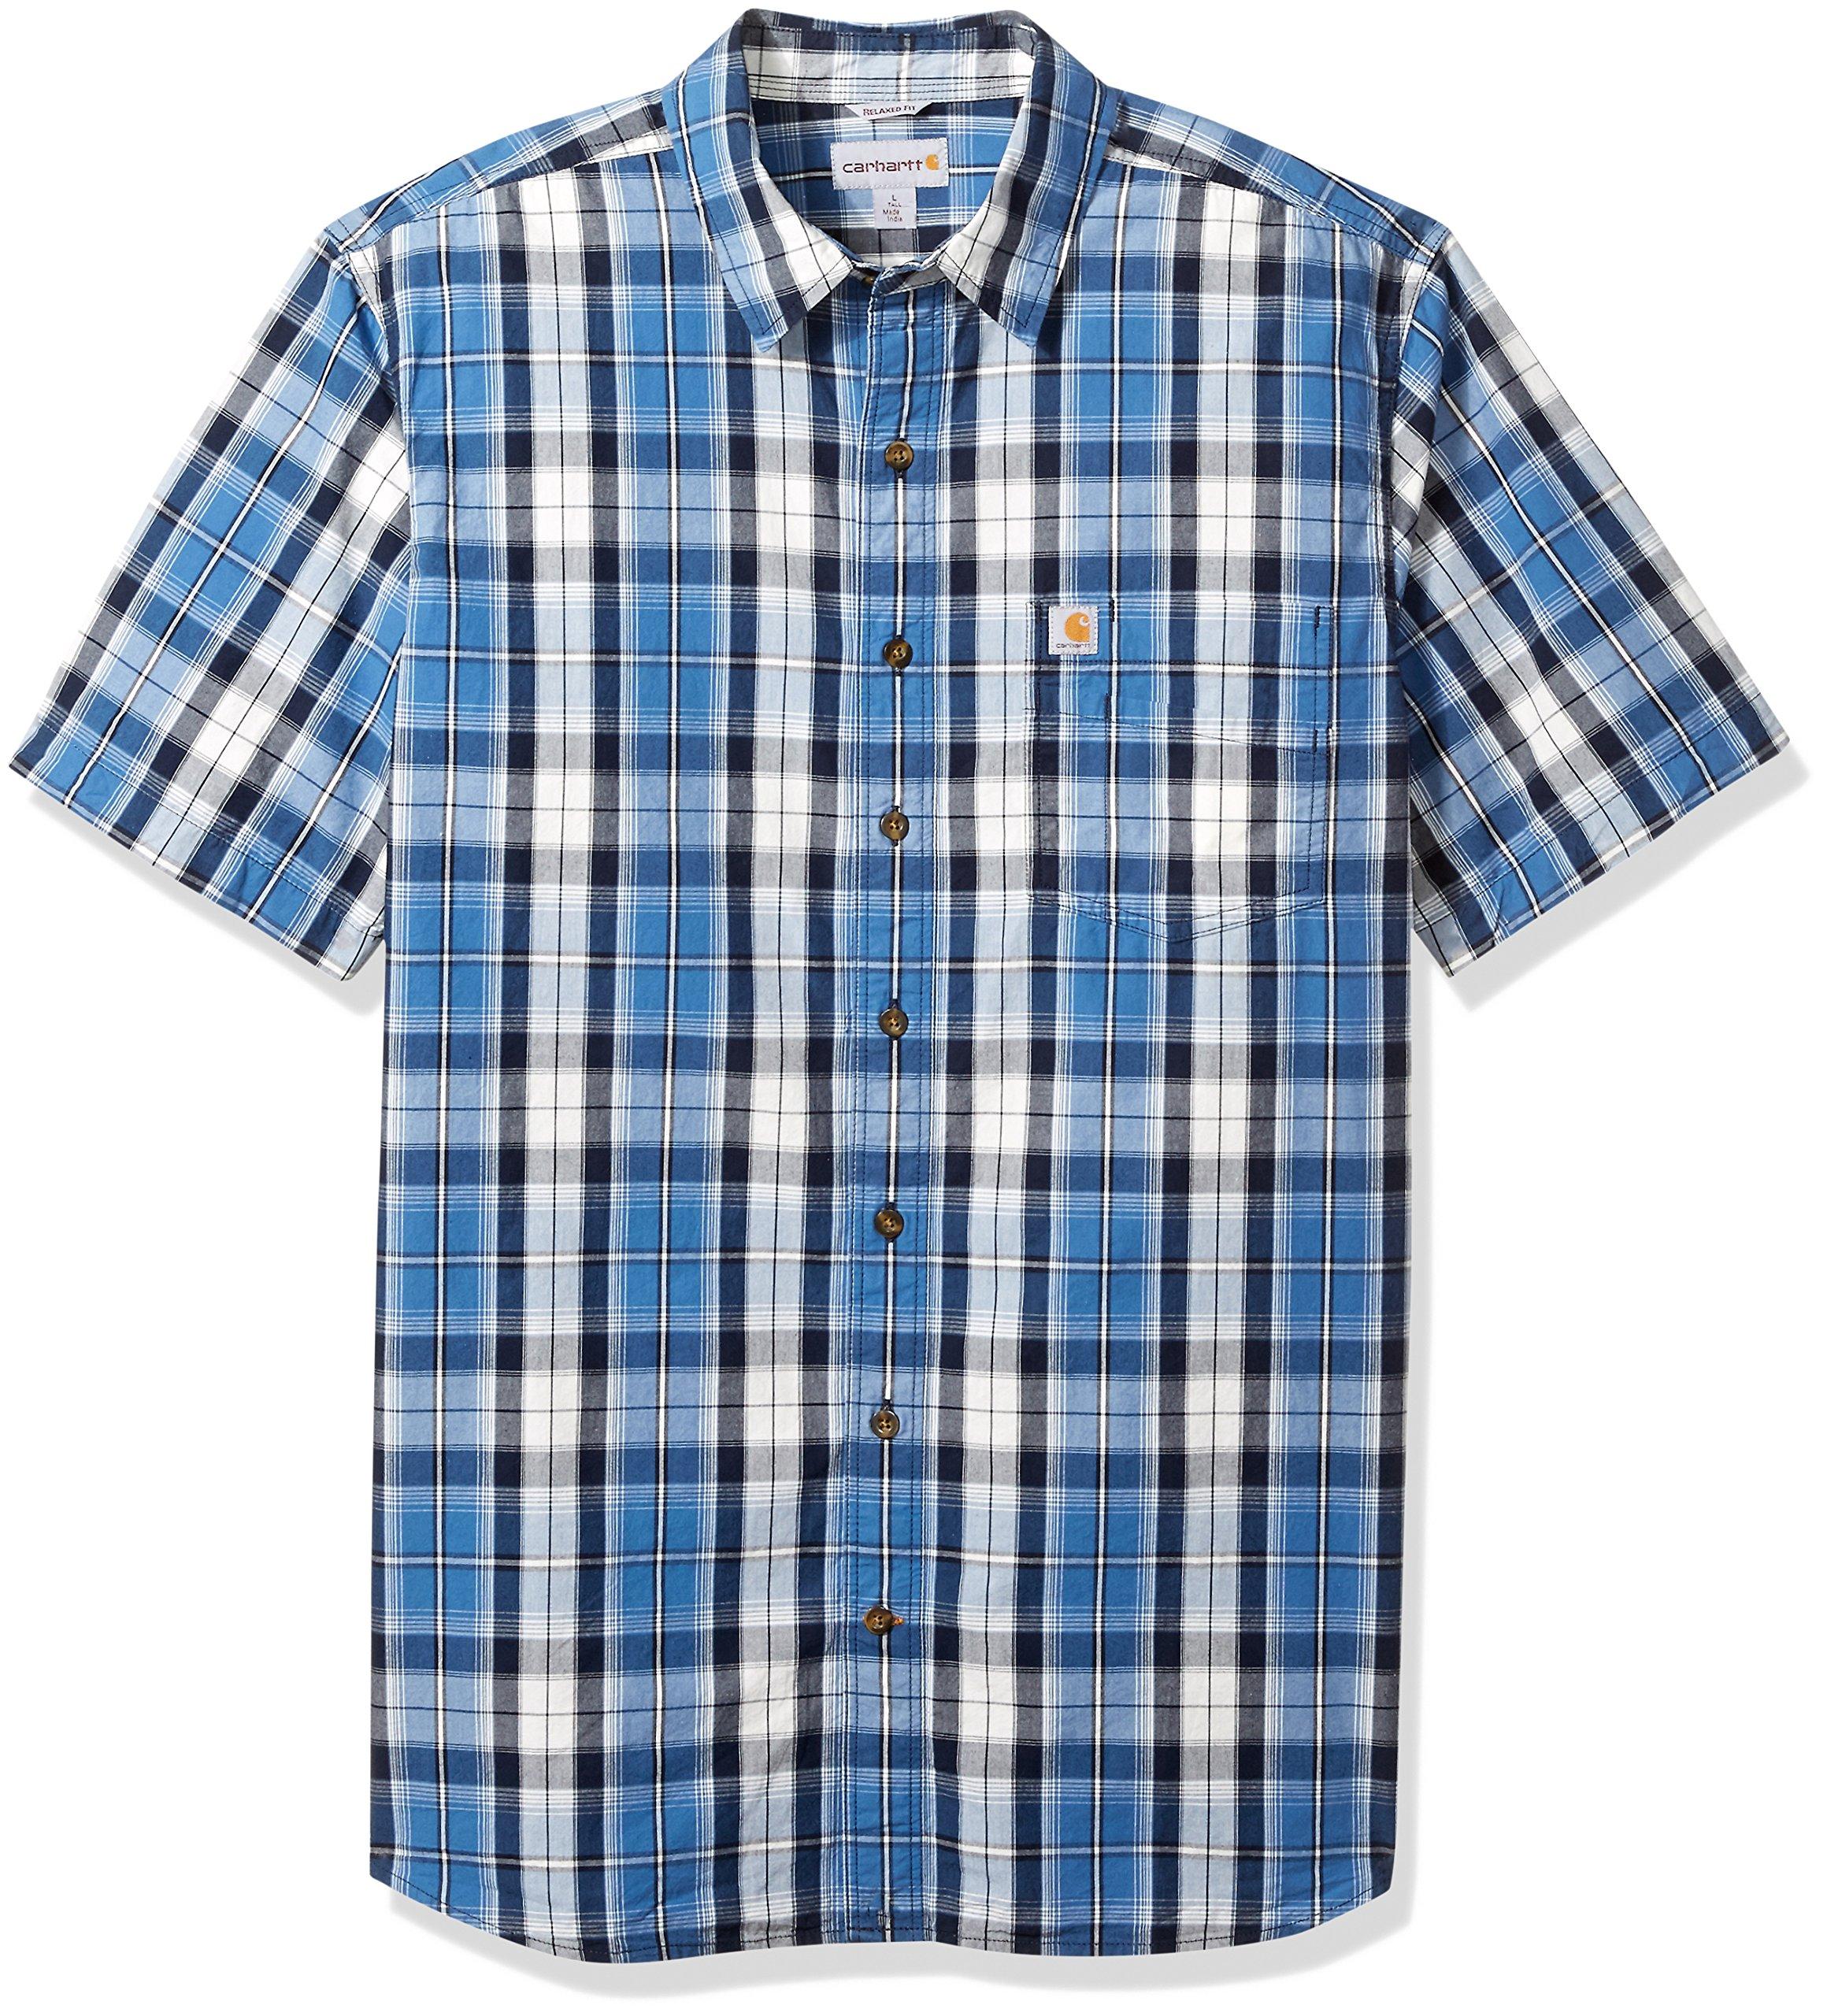 Carhartt Mens Big /& Tall Essential Plaid Button Down Collar Ss Shirt